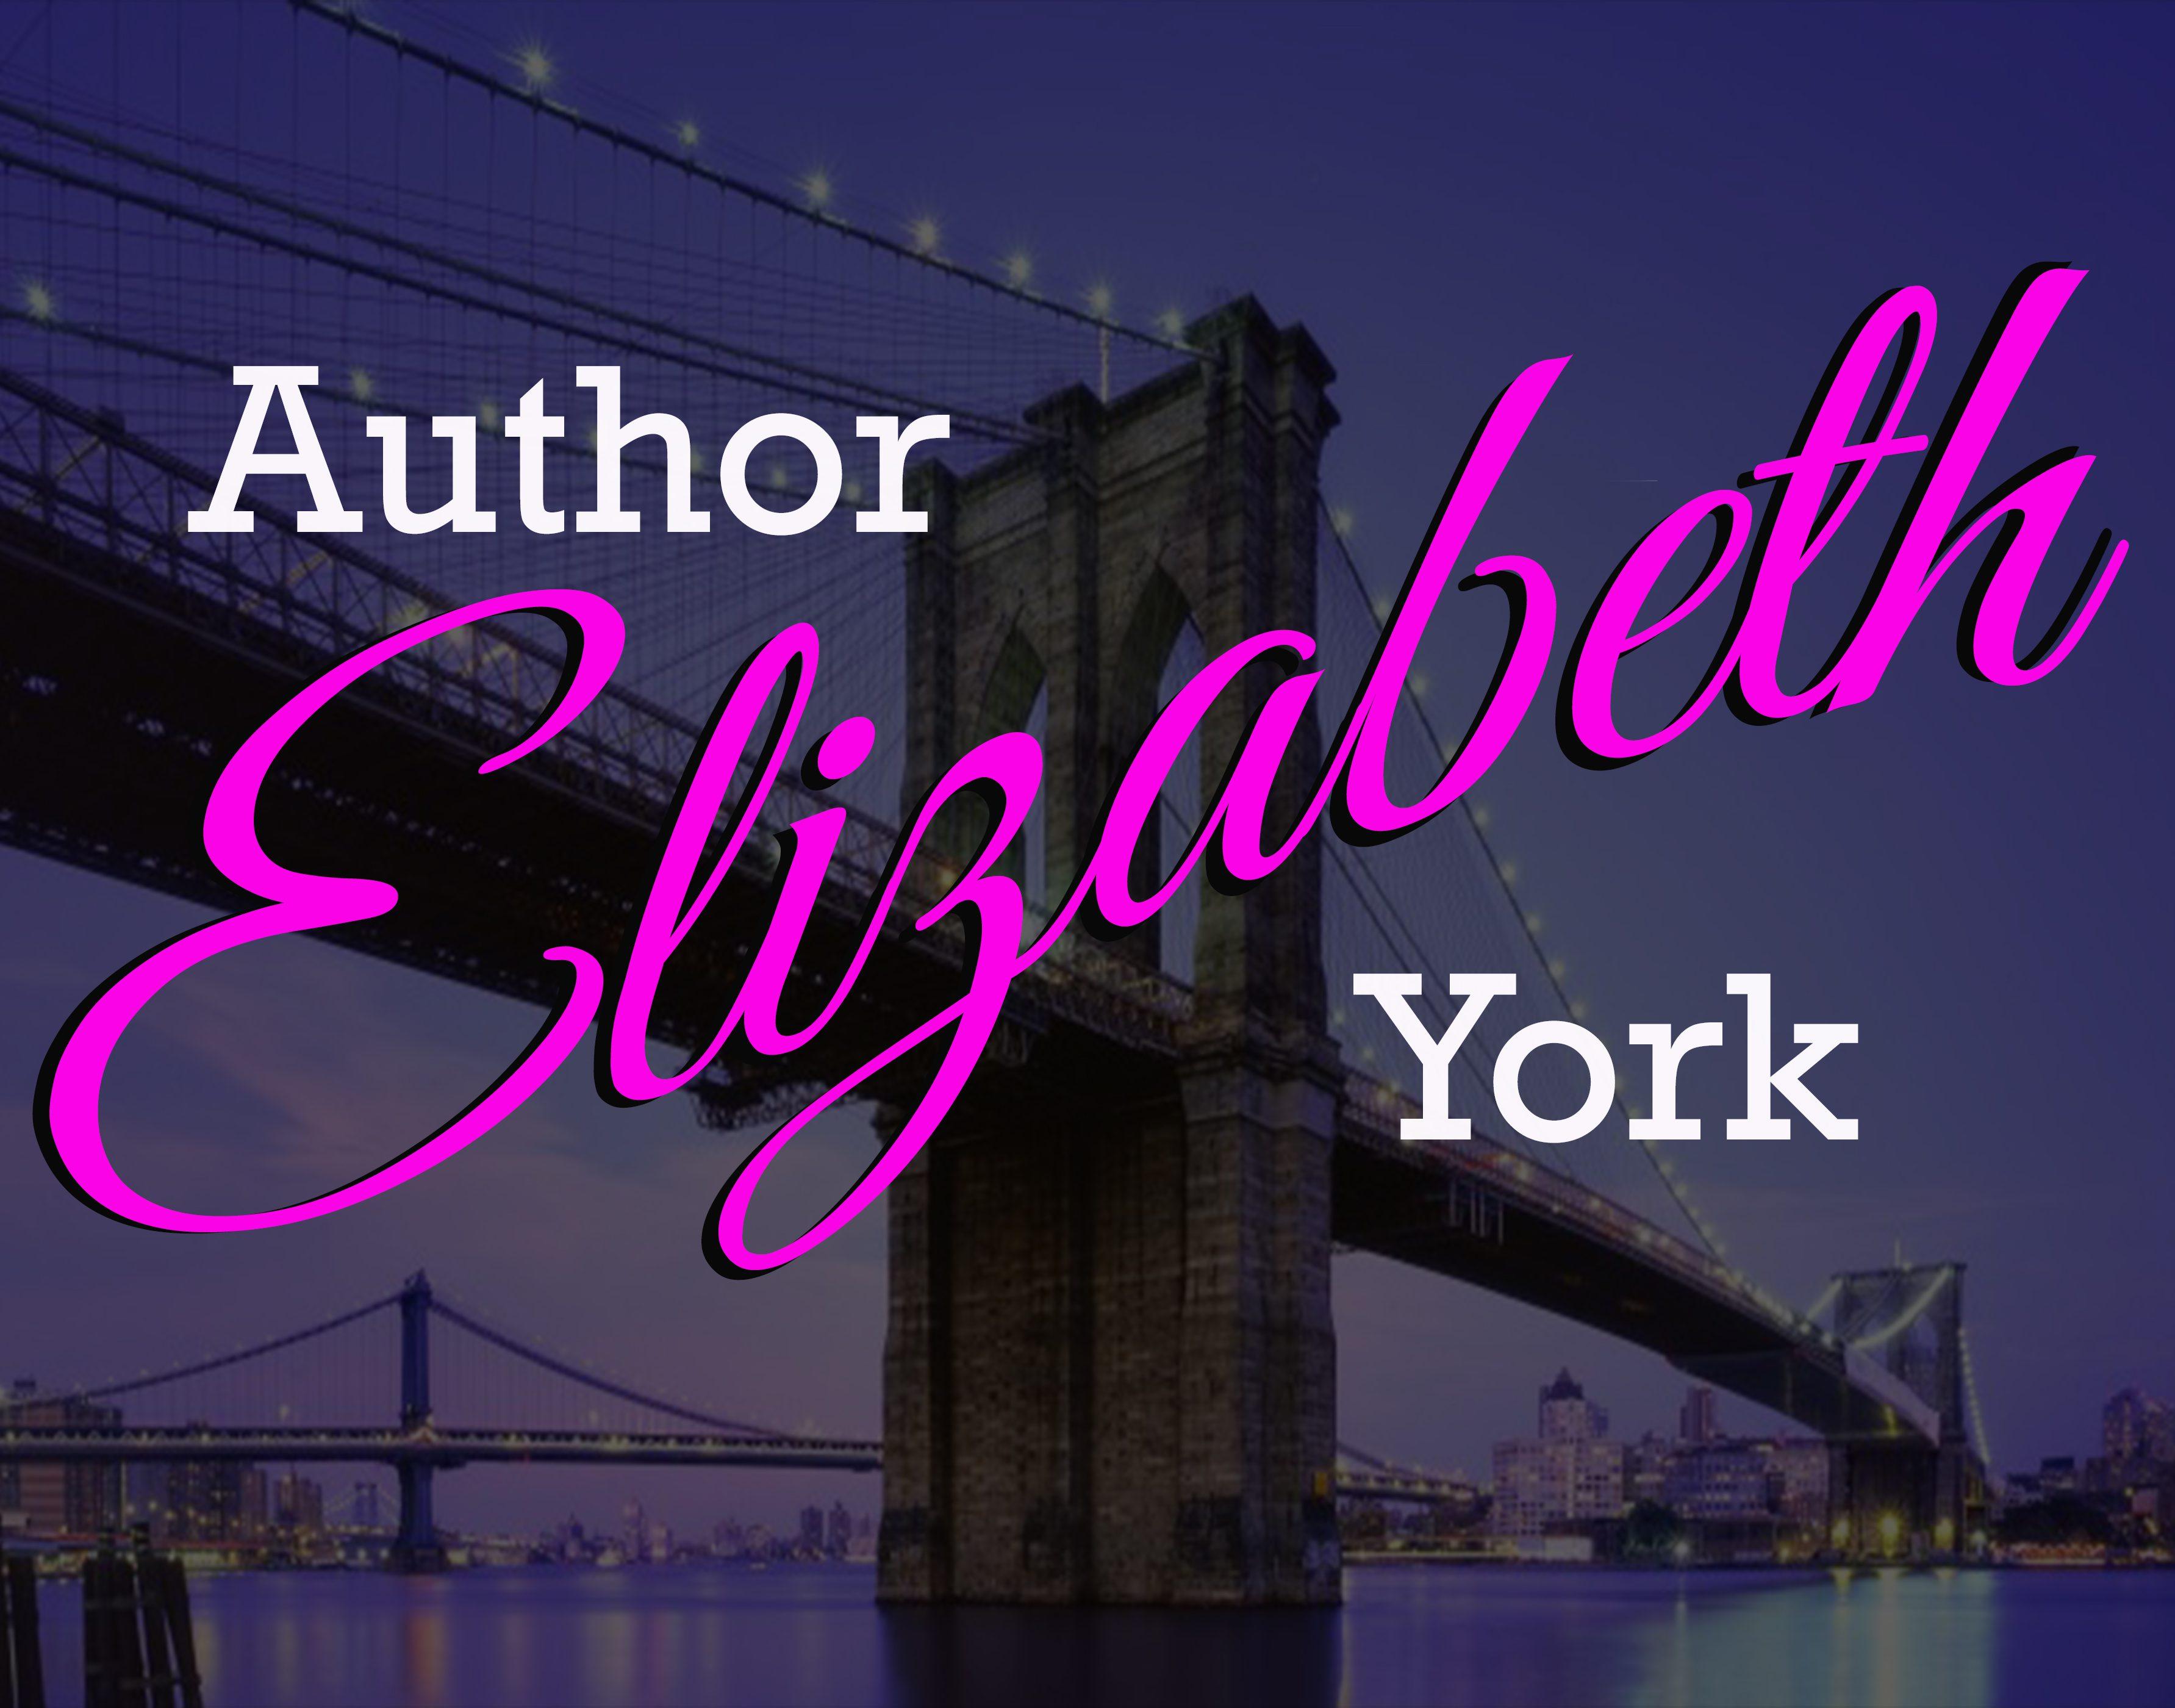 Author Elizabeth York